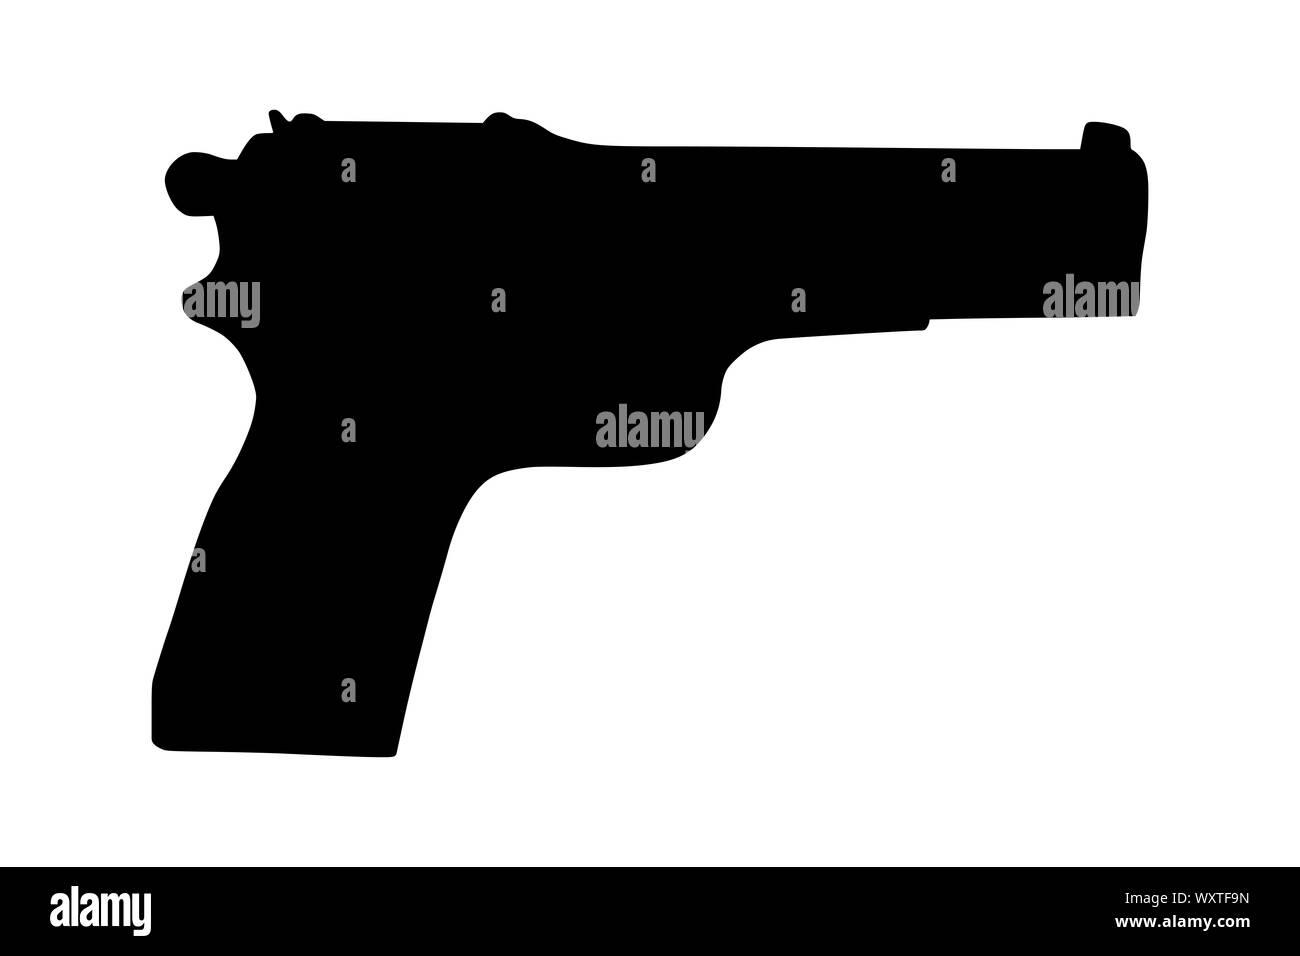 hand gun pistol vector illustration sign icon symbol logo etc stock photo alamy https www alamy com hand gun pistol vector illustration sign iconsymbollogo etc image274675457 html